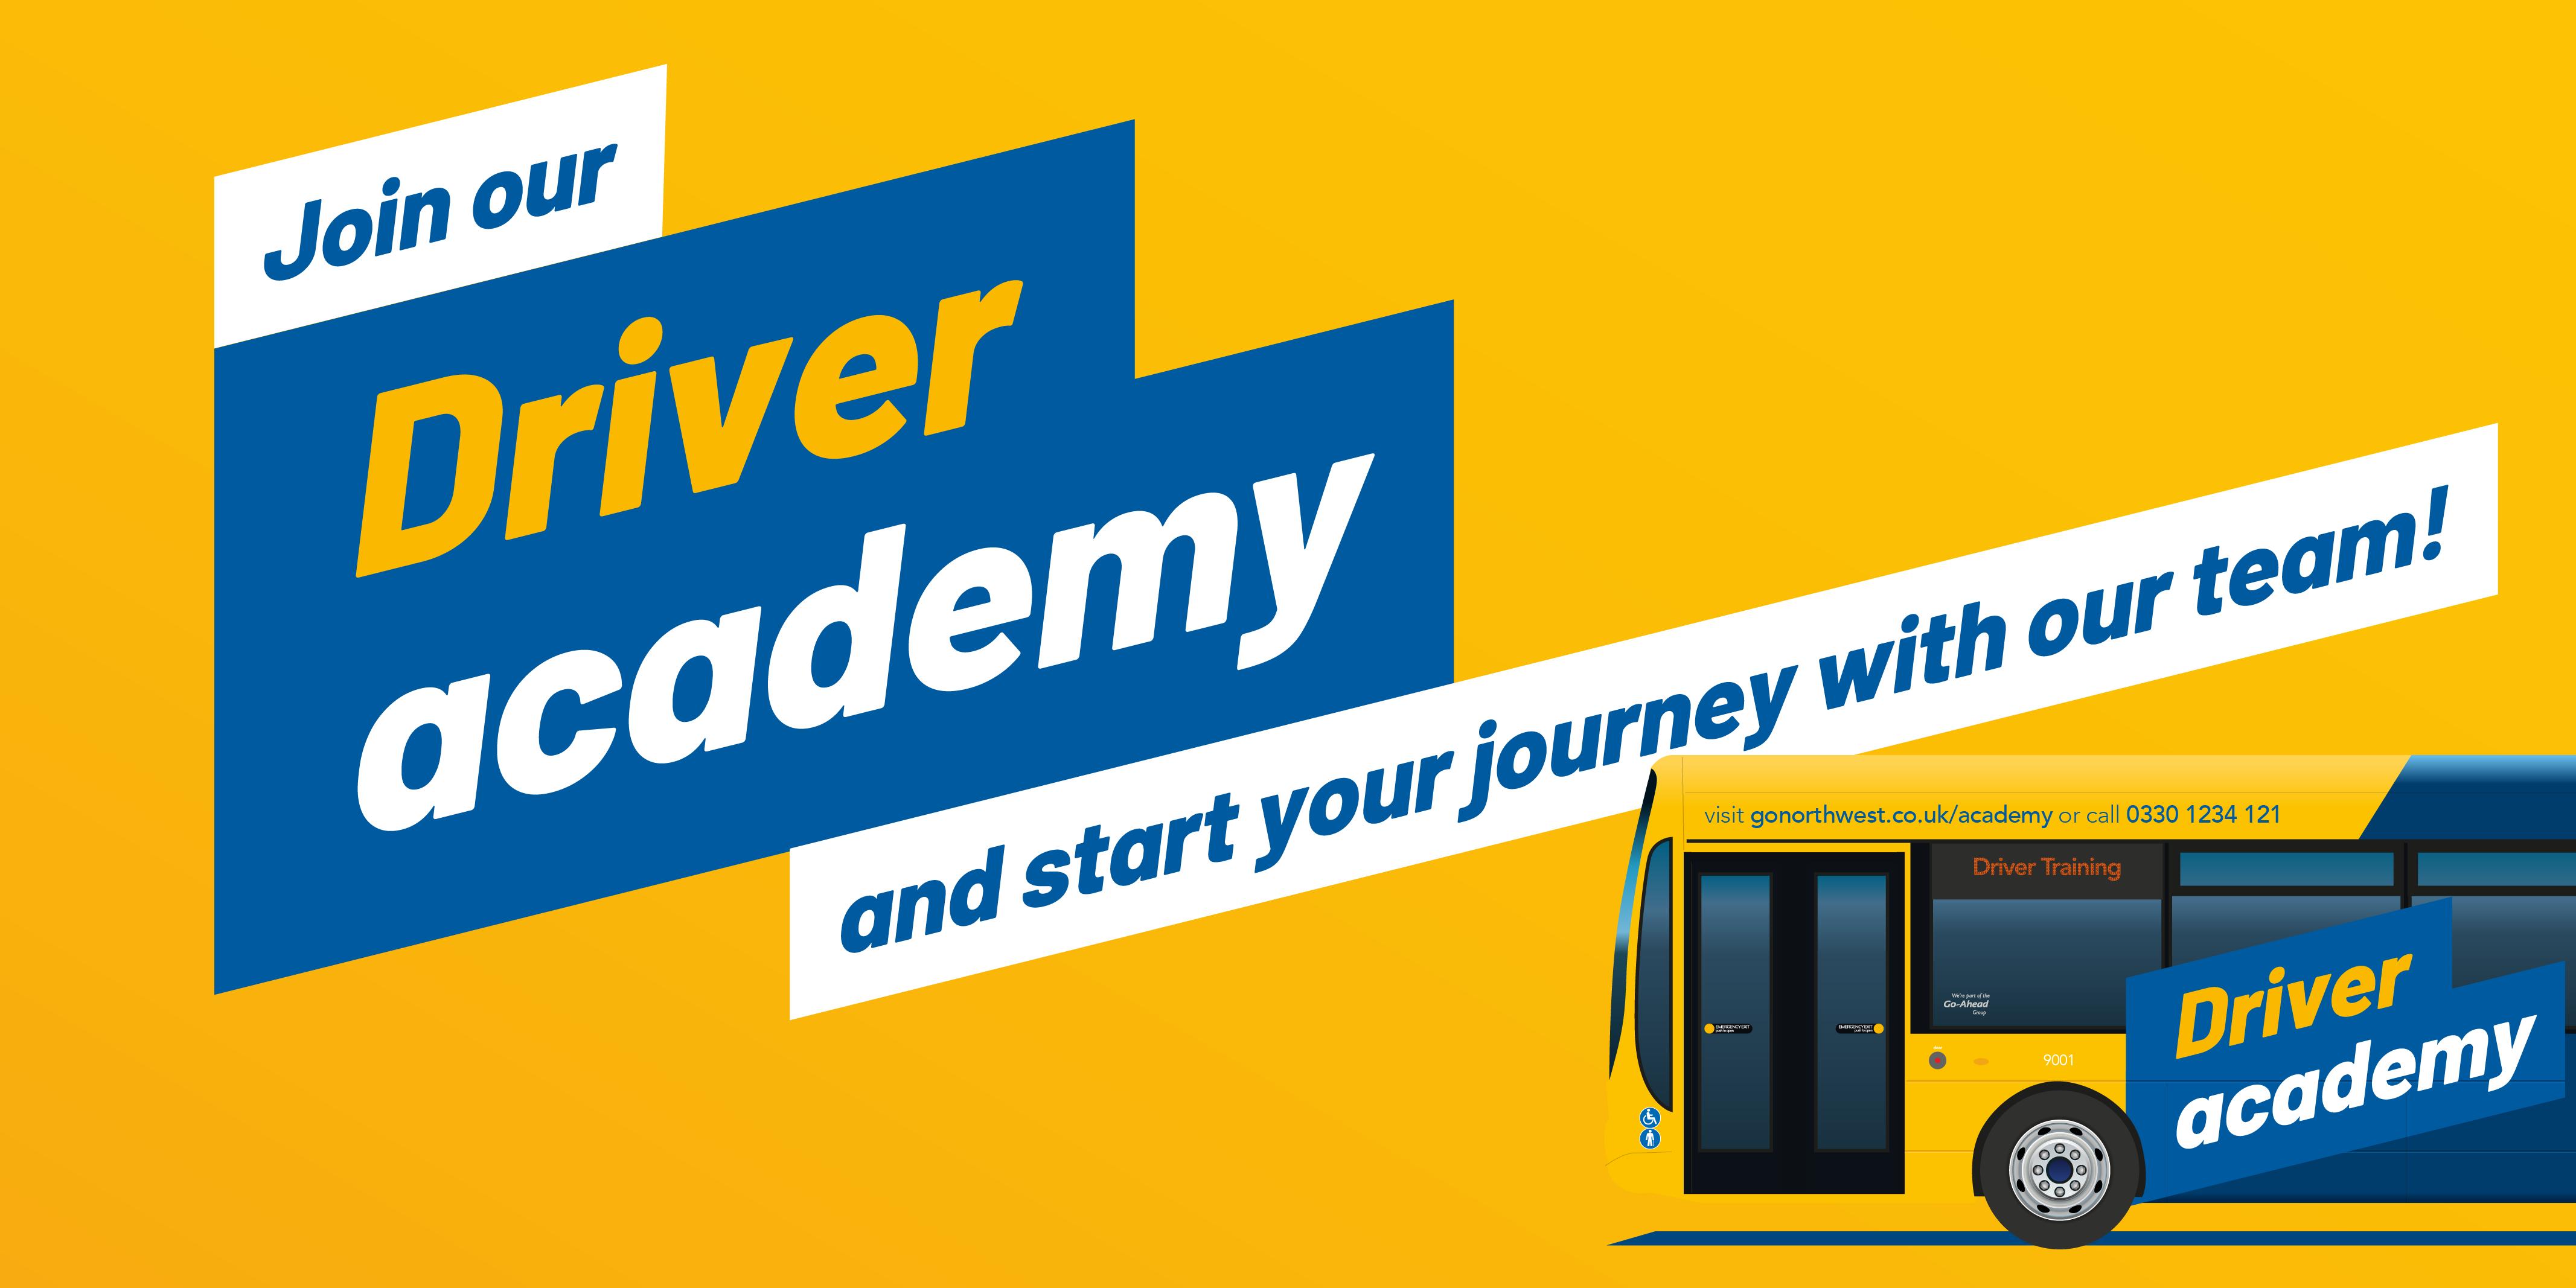 Driver academy